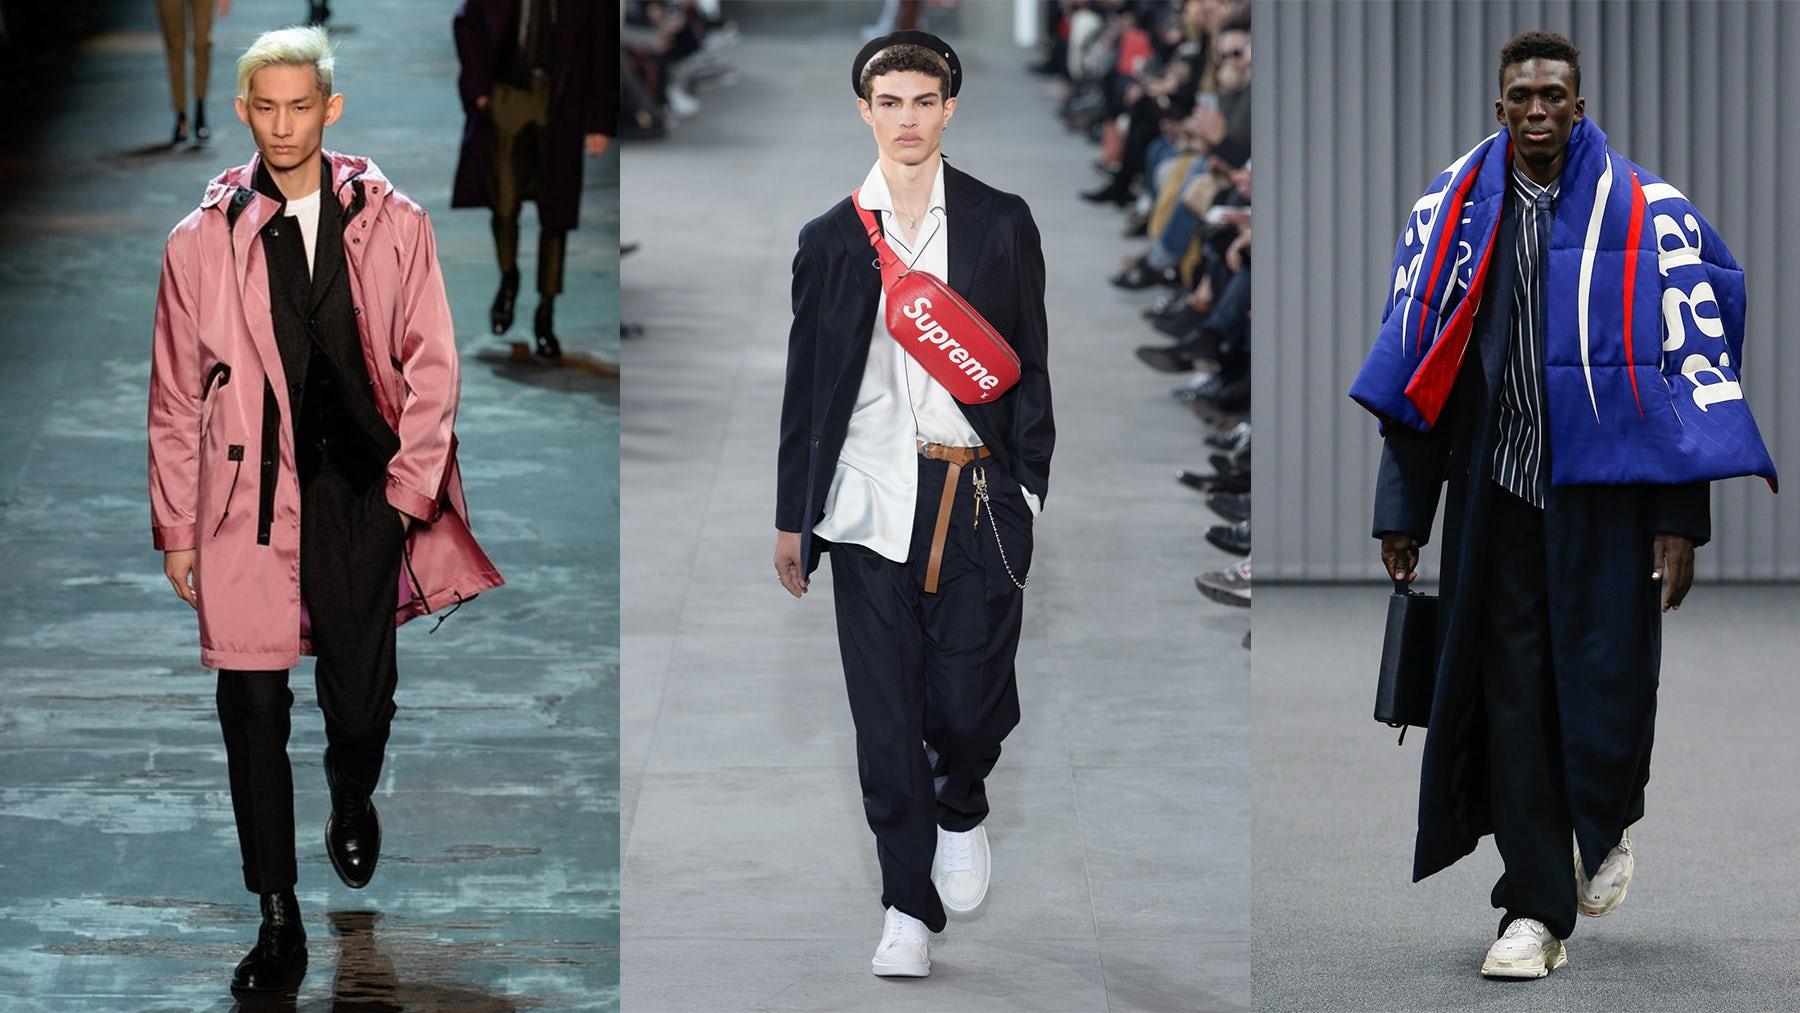 From left: Berluti, Louis Vuitton, Balenciaga | Source: InDigital